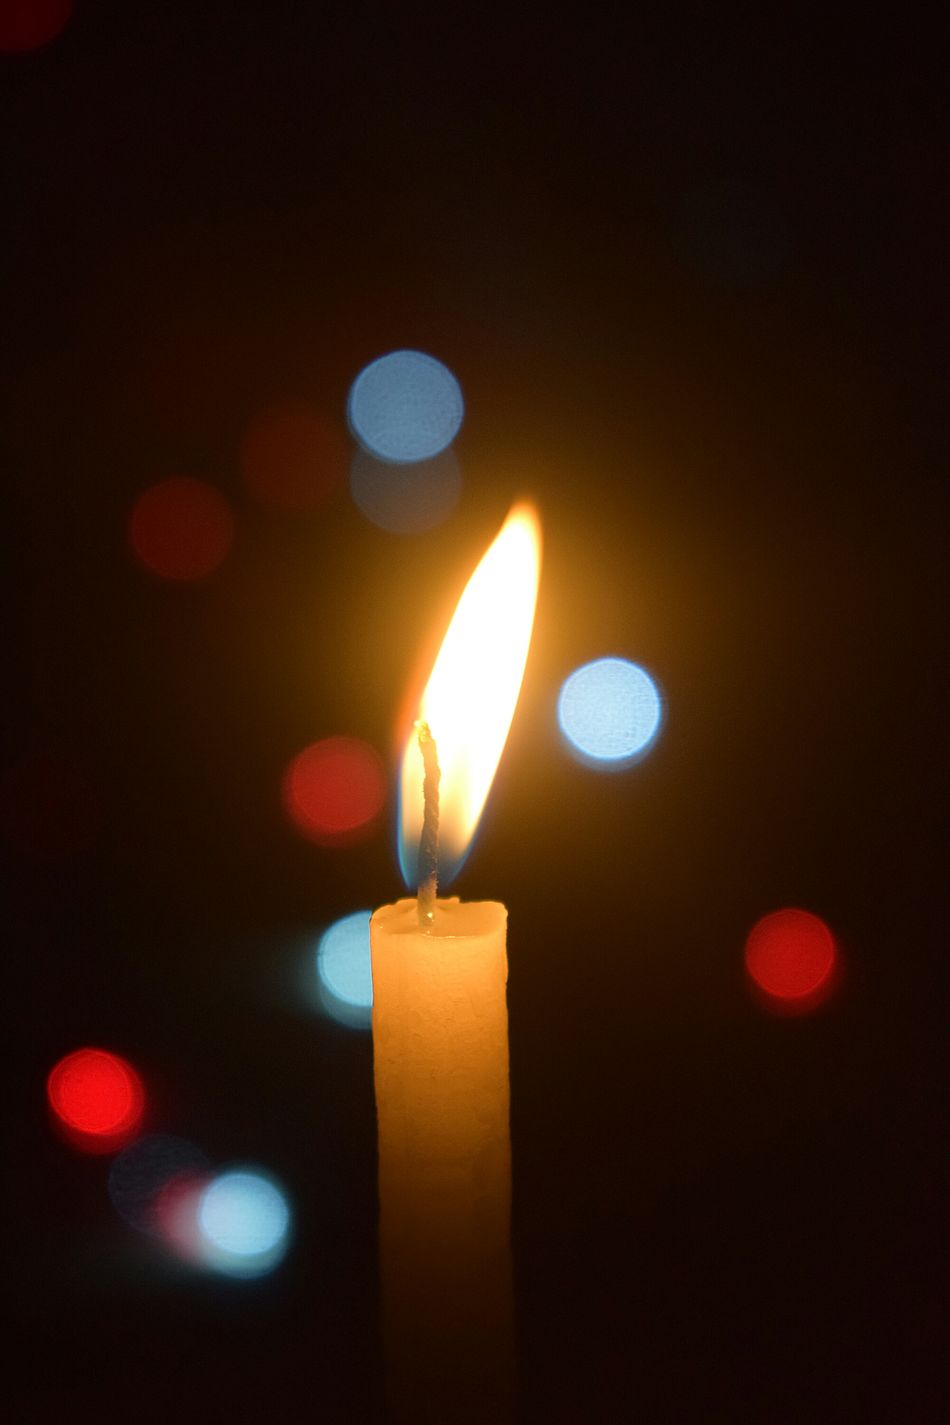 Candle light fun Candle Candle Light Candles.❤ Close-up Indoors  Spotlight Candles Candle Night Candlefun Candleshoot EyeEmNewHere EyeEmNewHere